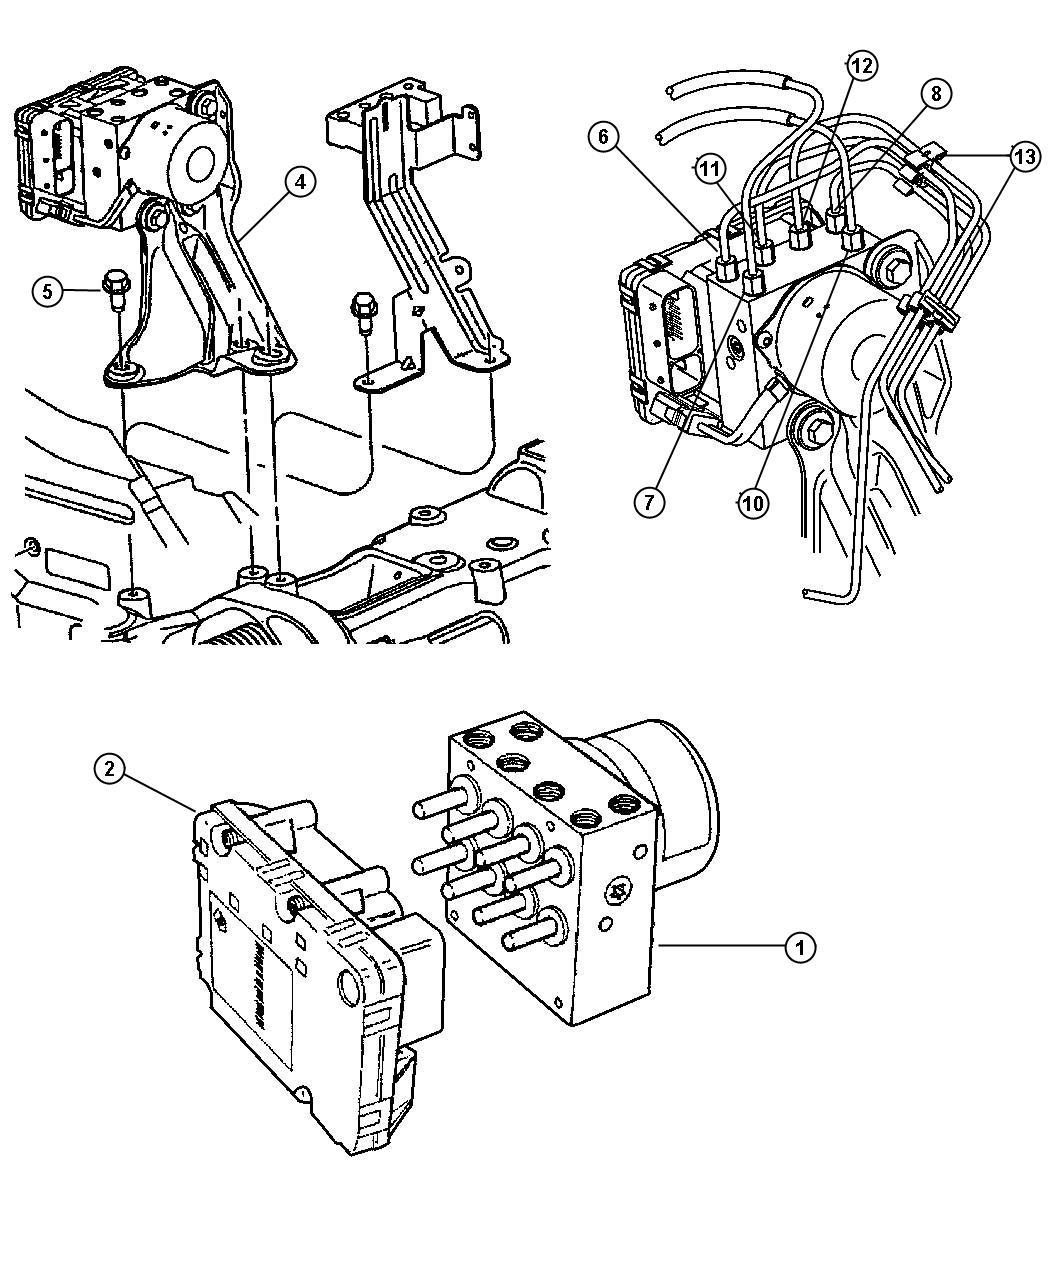 2005 Dodge Grand Caravan Module. Anti-lock brakes. Bnm